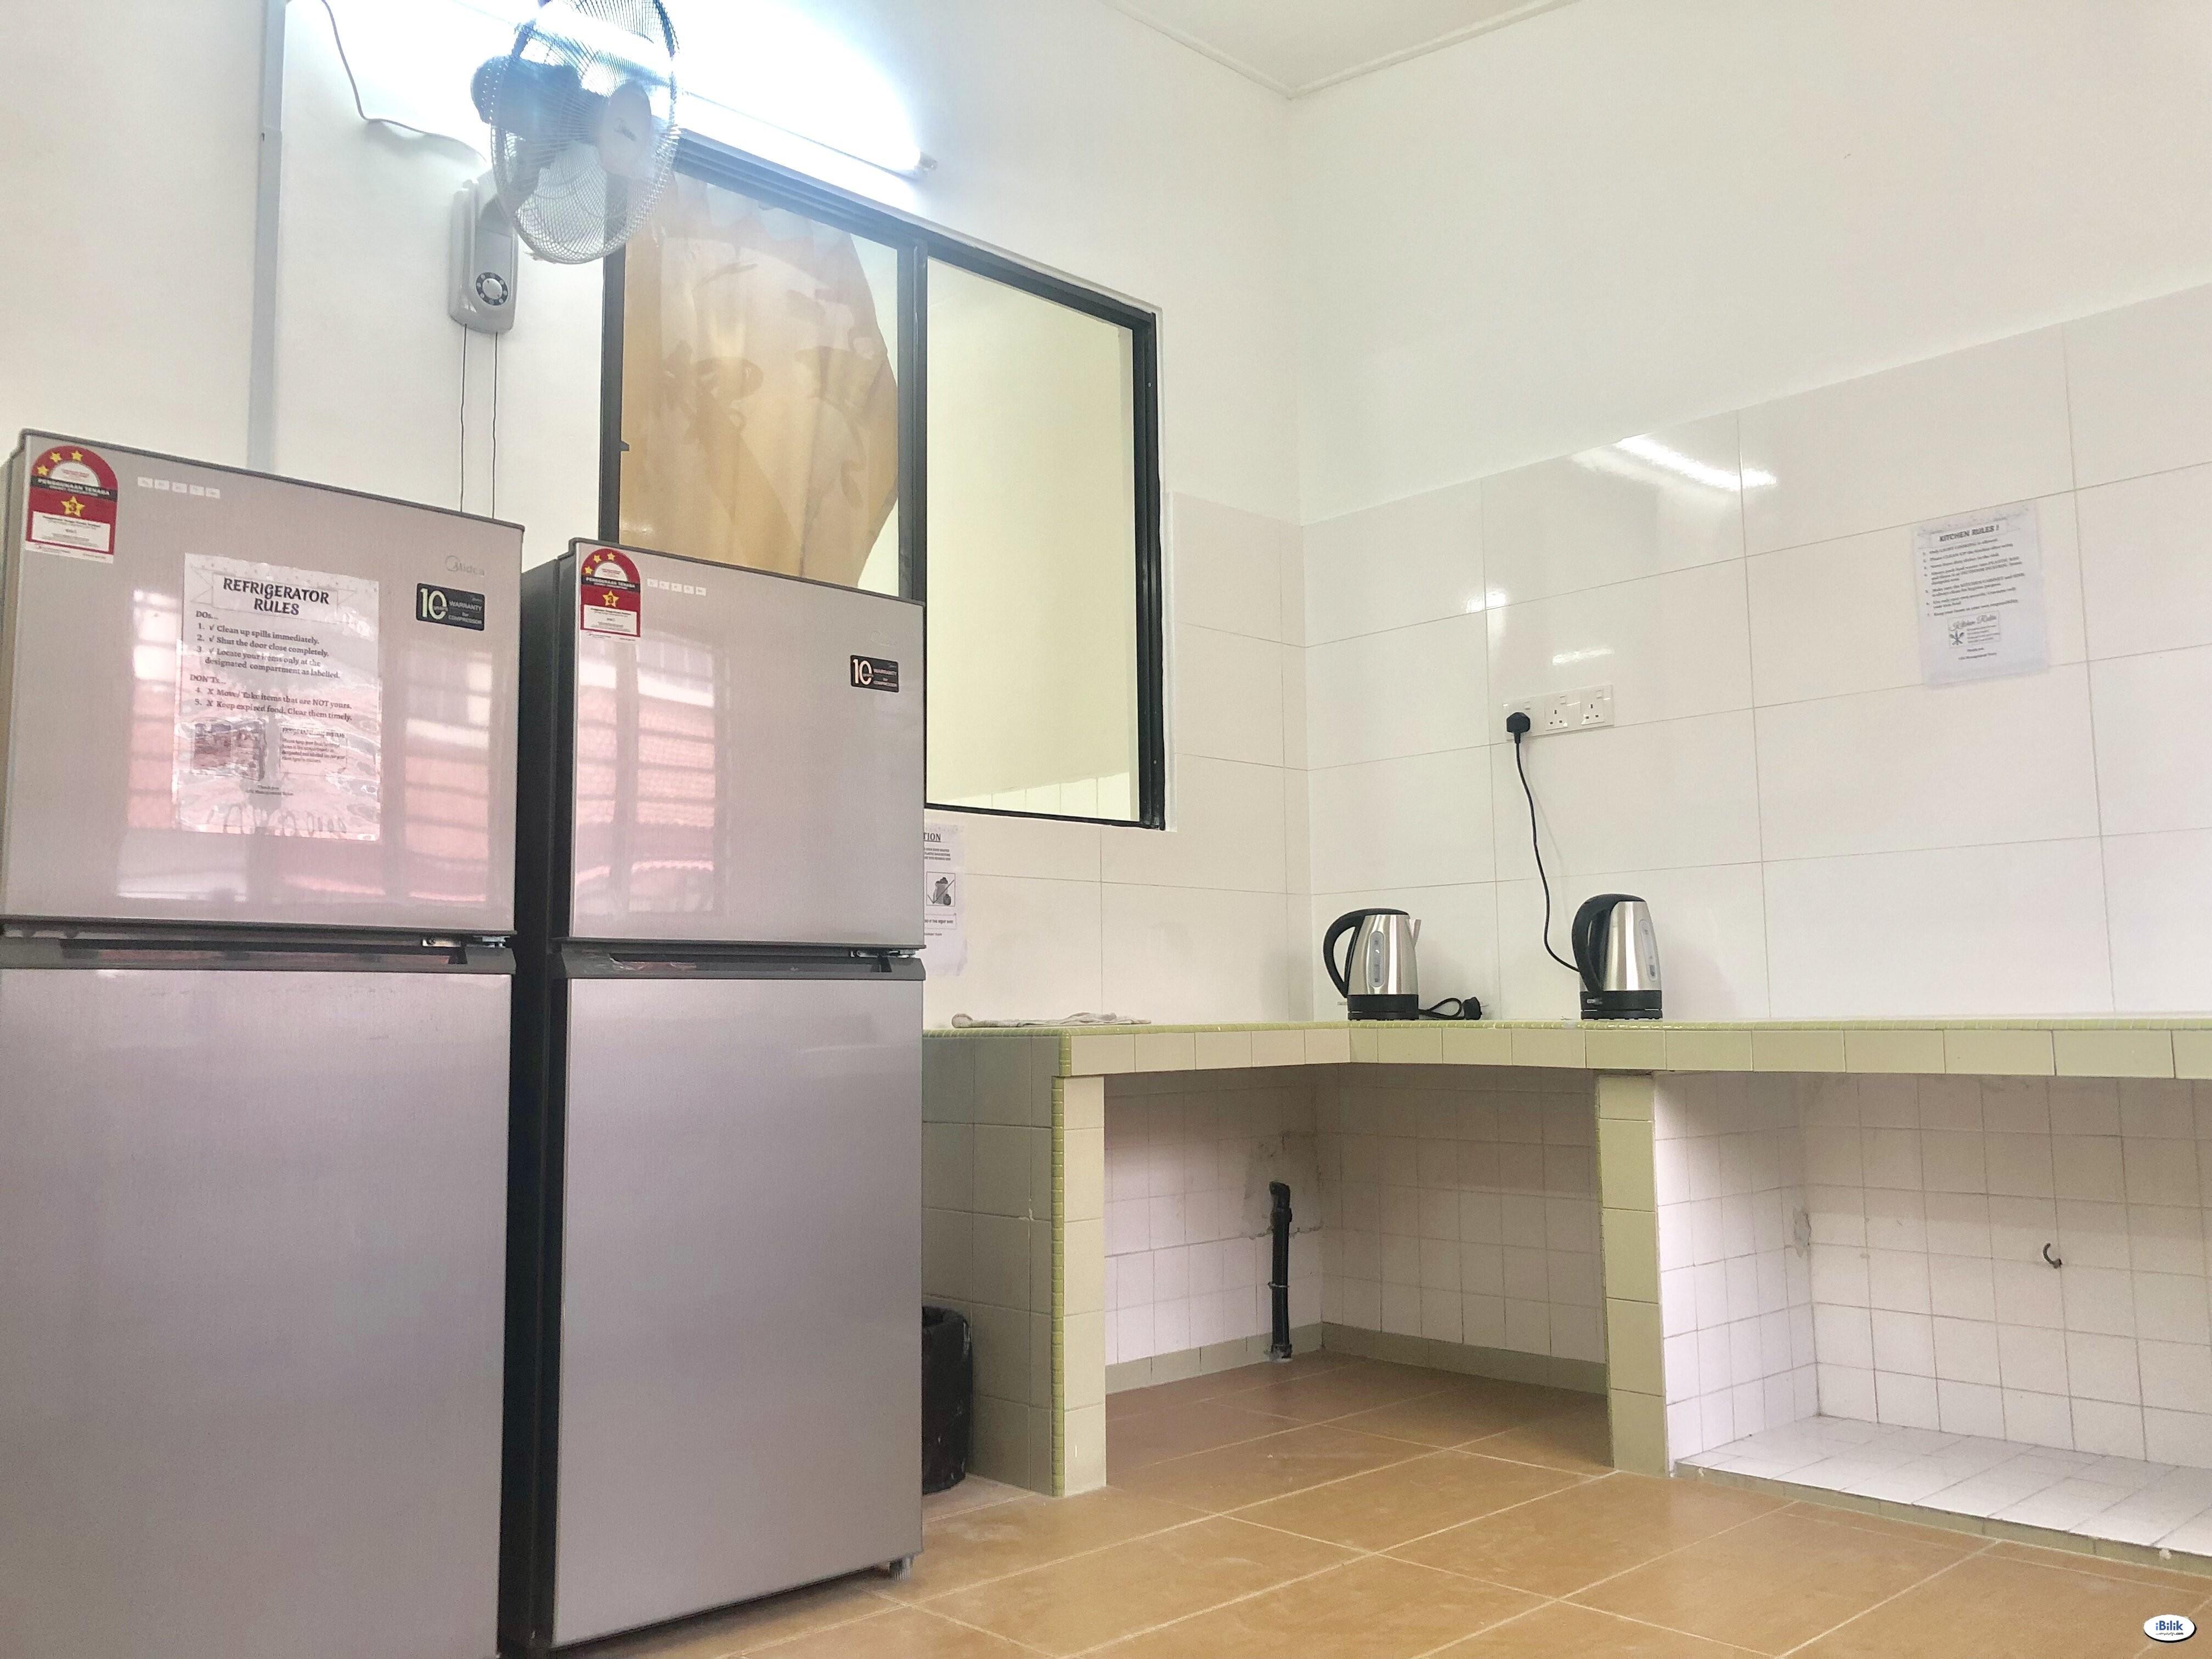 Middle Room at Kota Damansara, Petaling Jaya 🌈🌼